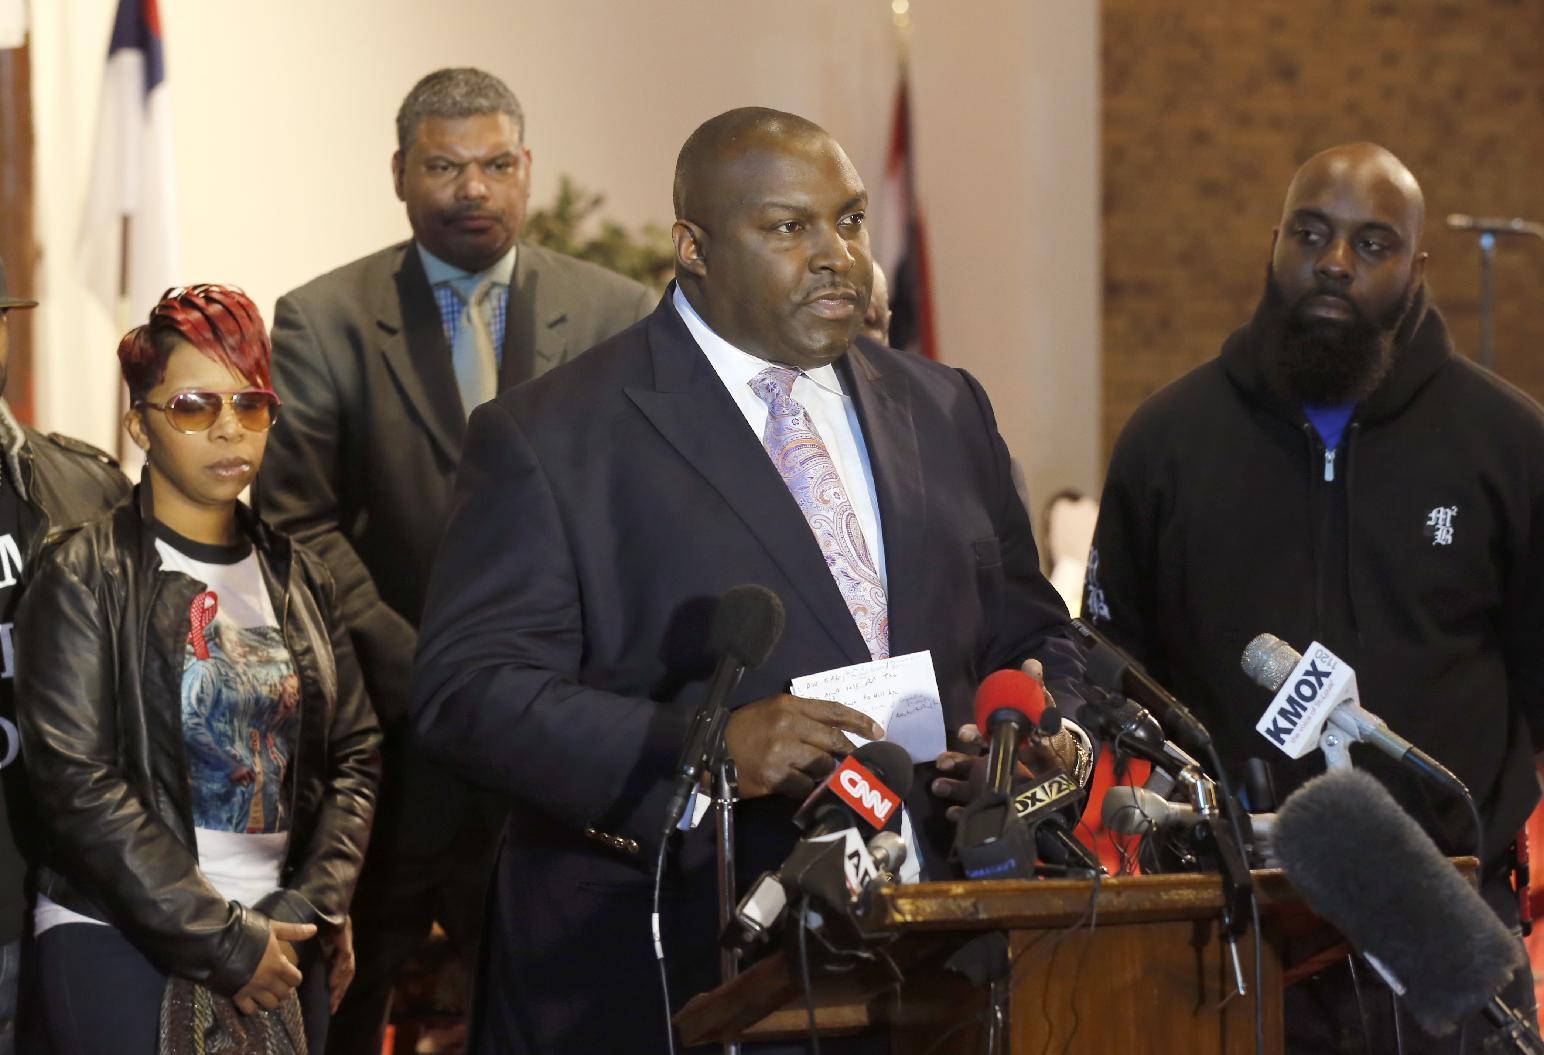 Ferguson grand jury wanted to make public statement, documents reveal